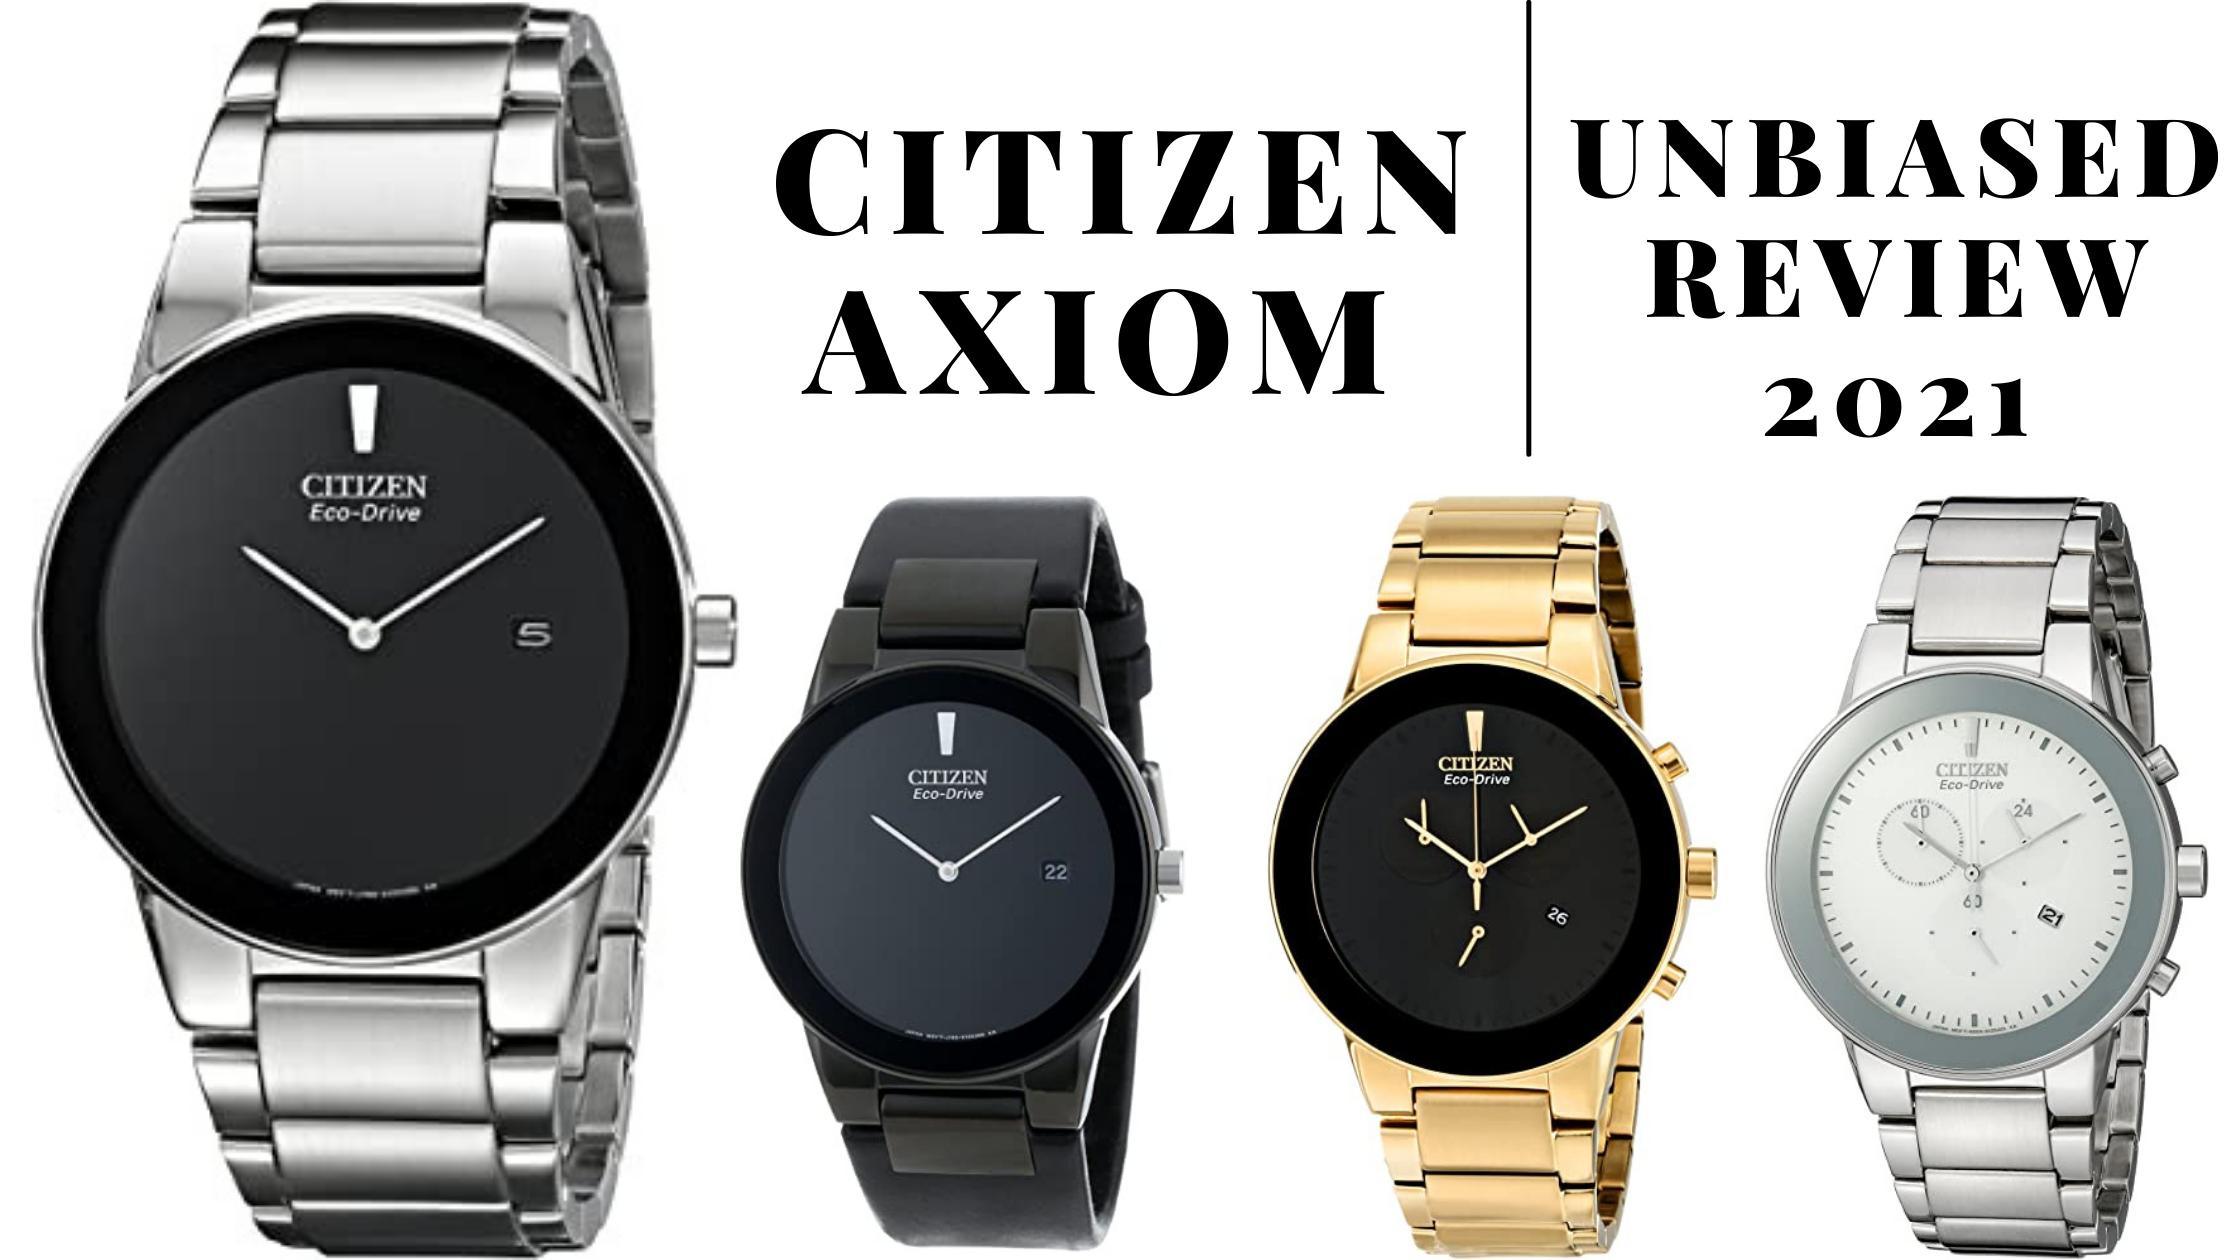 Citizen Axiom Watch Review